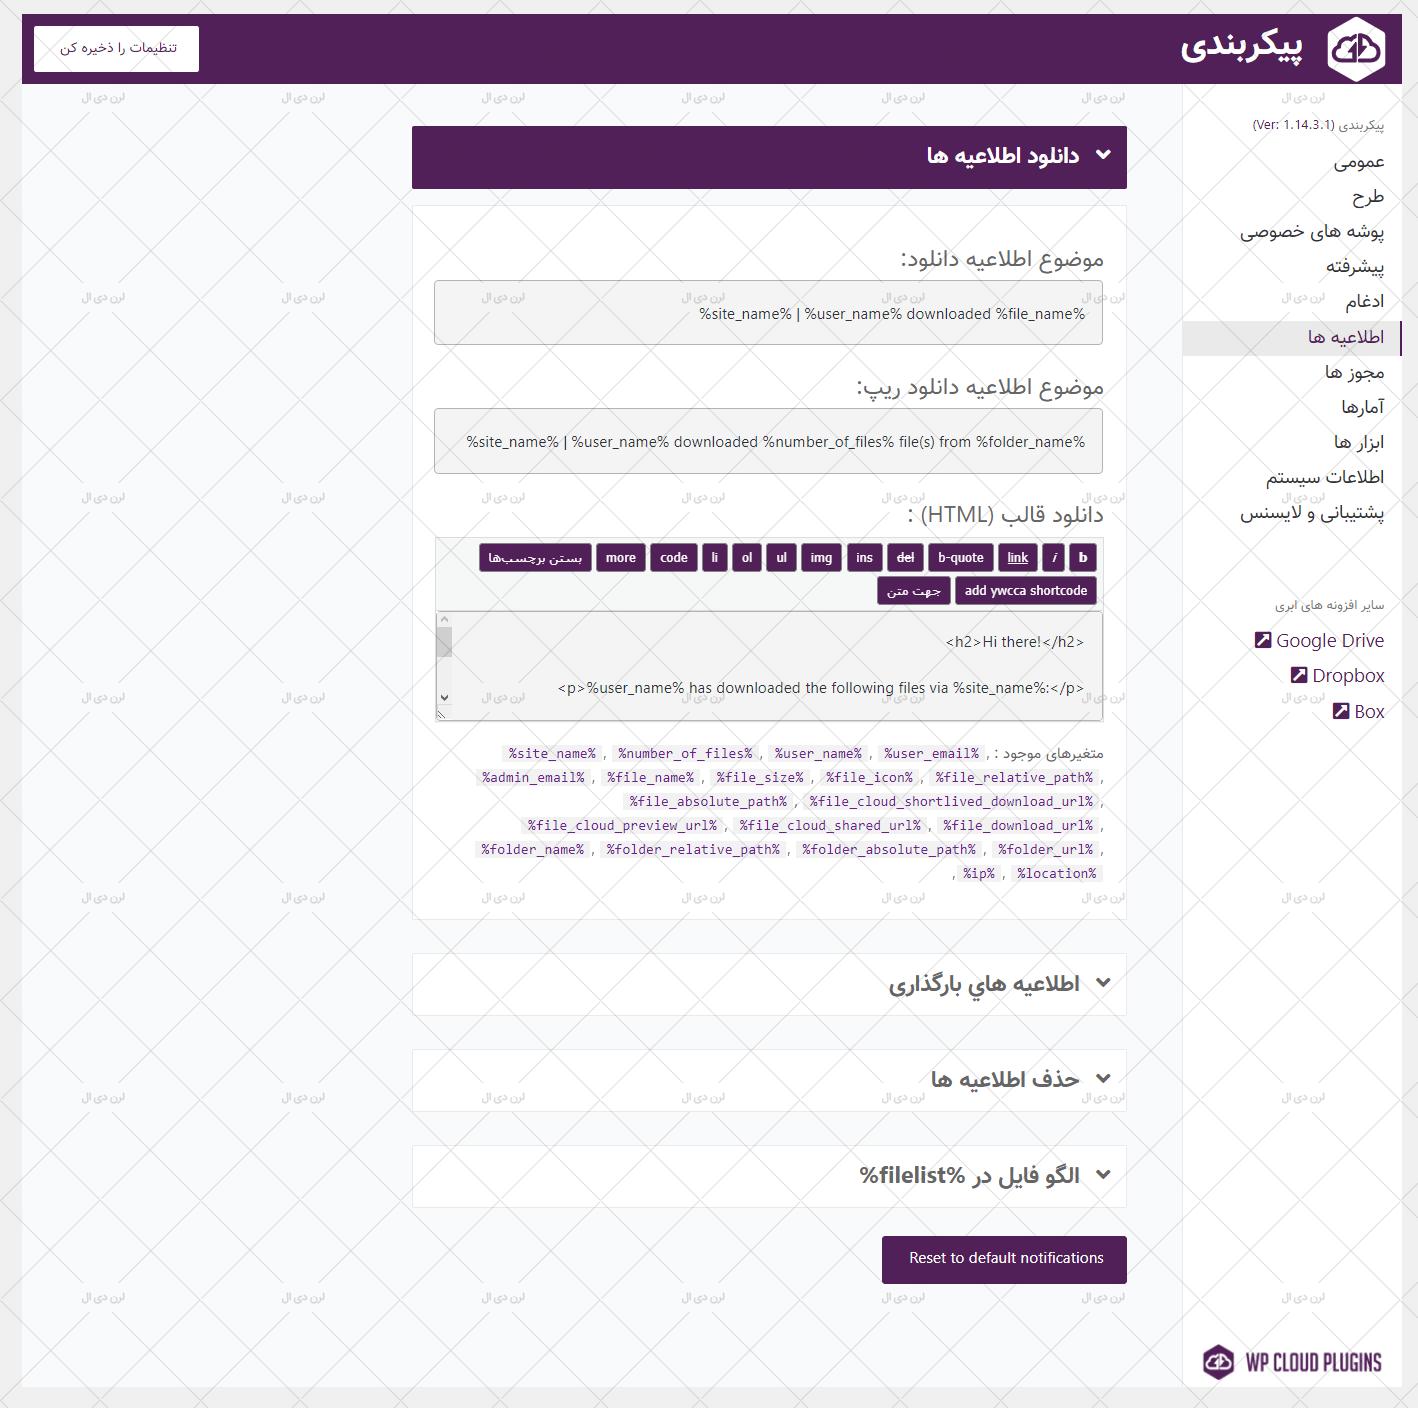 افزونه وردپرس Share-one-Drive فارسی